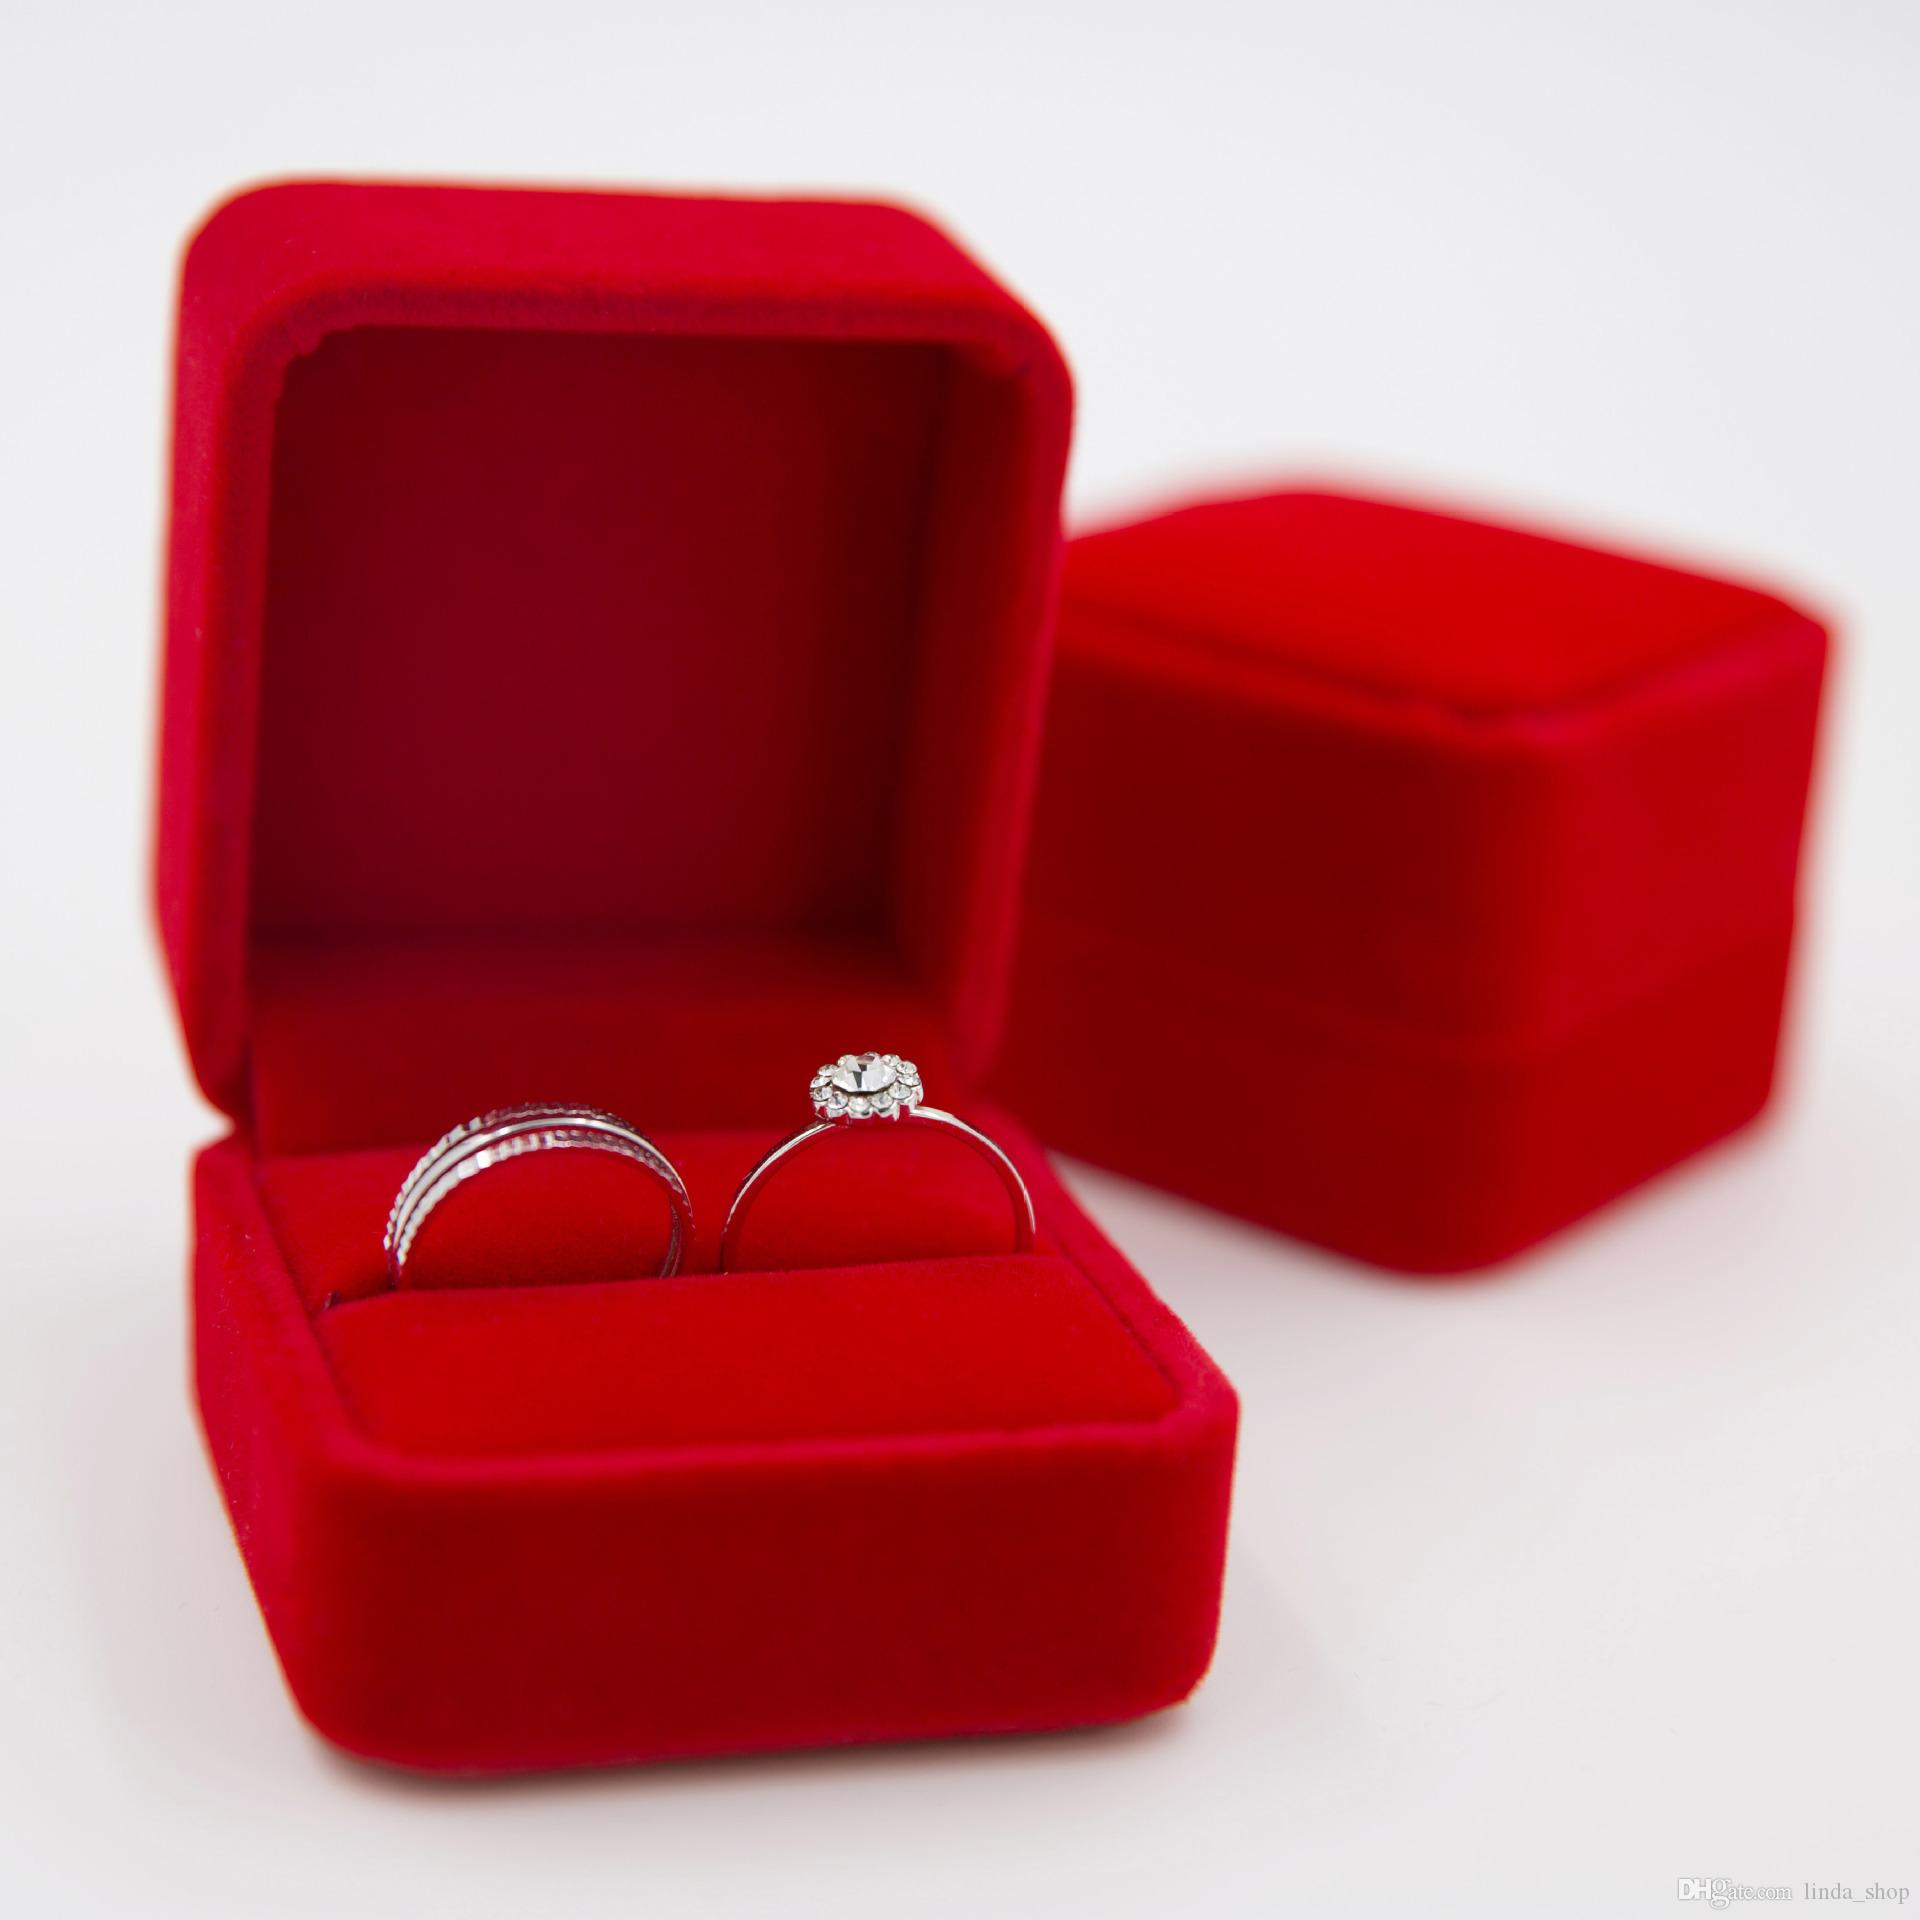 Luxurious Velvet Round Corner Red Ring Box 6cm*5.6cm*4.5cm Jewelry Boxes  Wedding Ring Box JB0041 2018 From Linda_shop